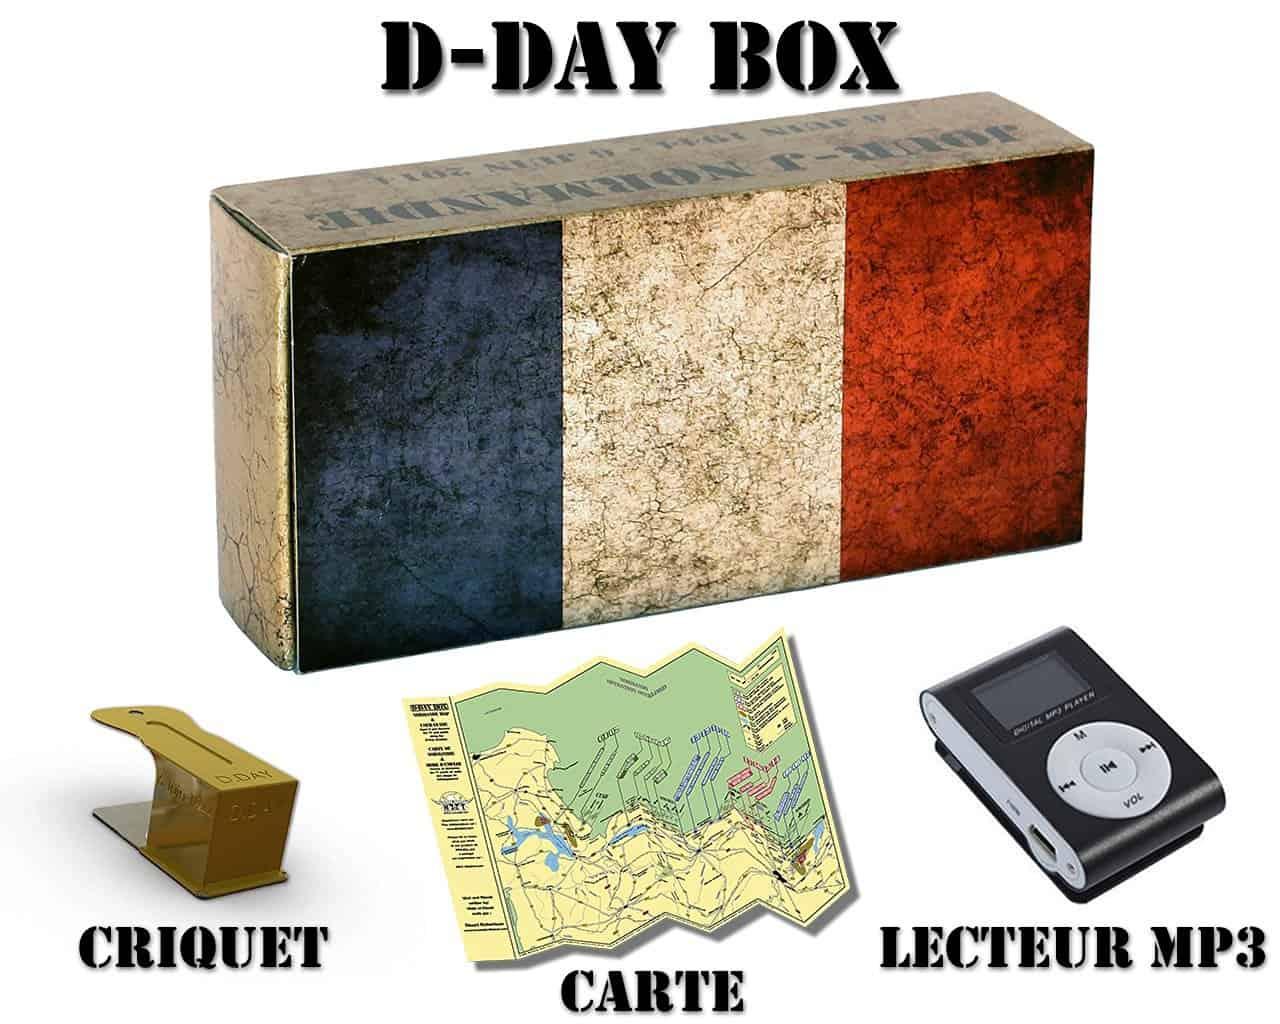 La D-Day box